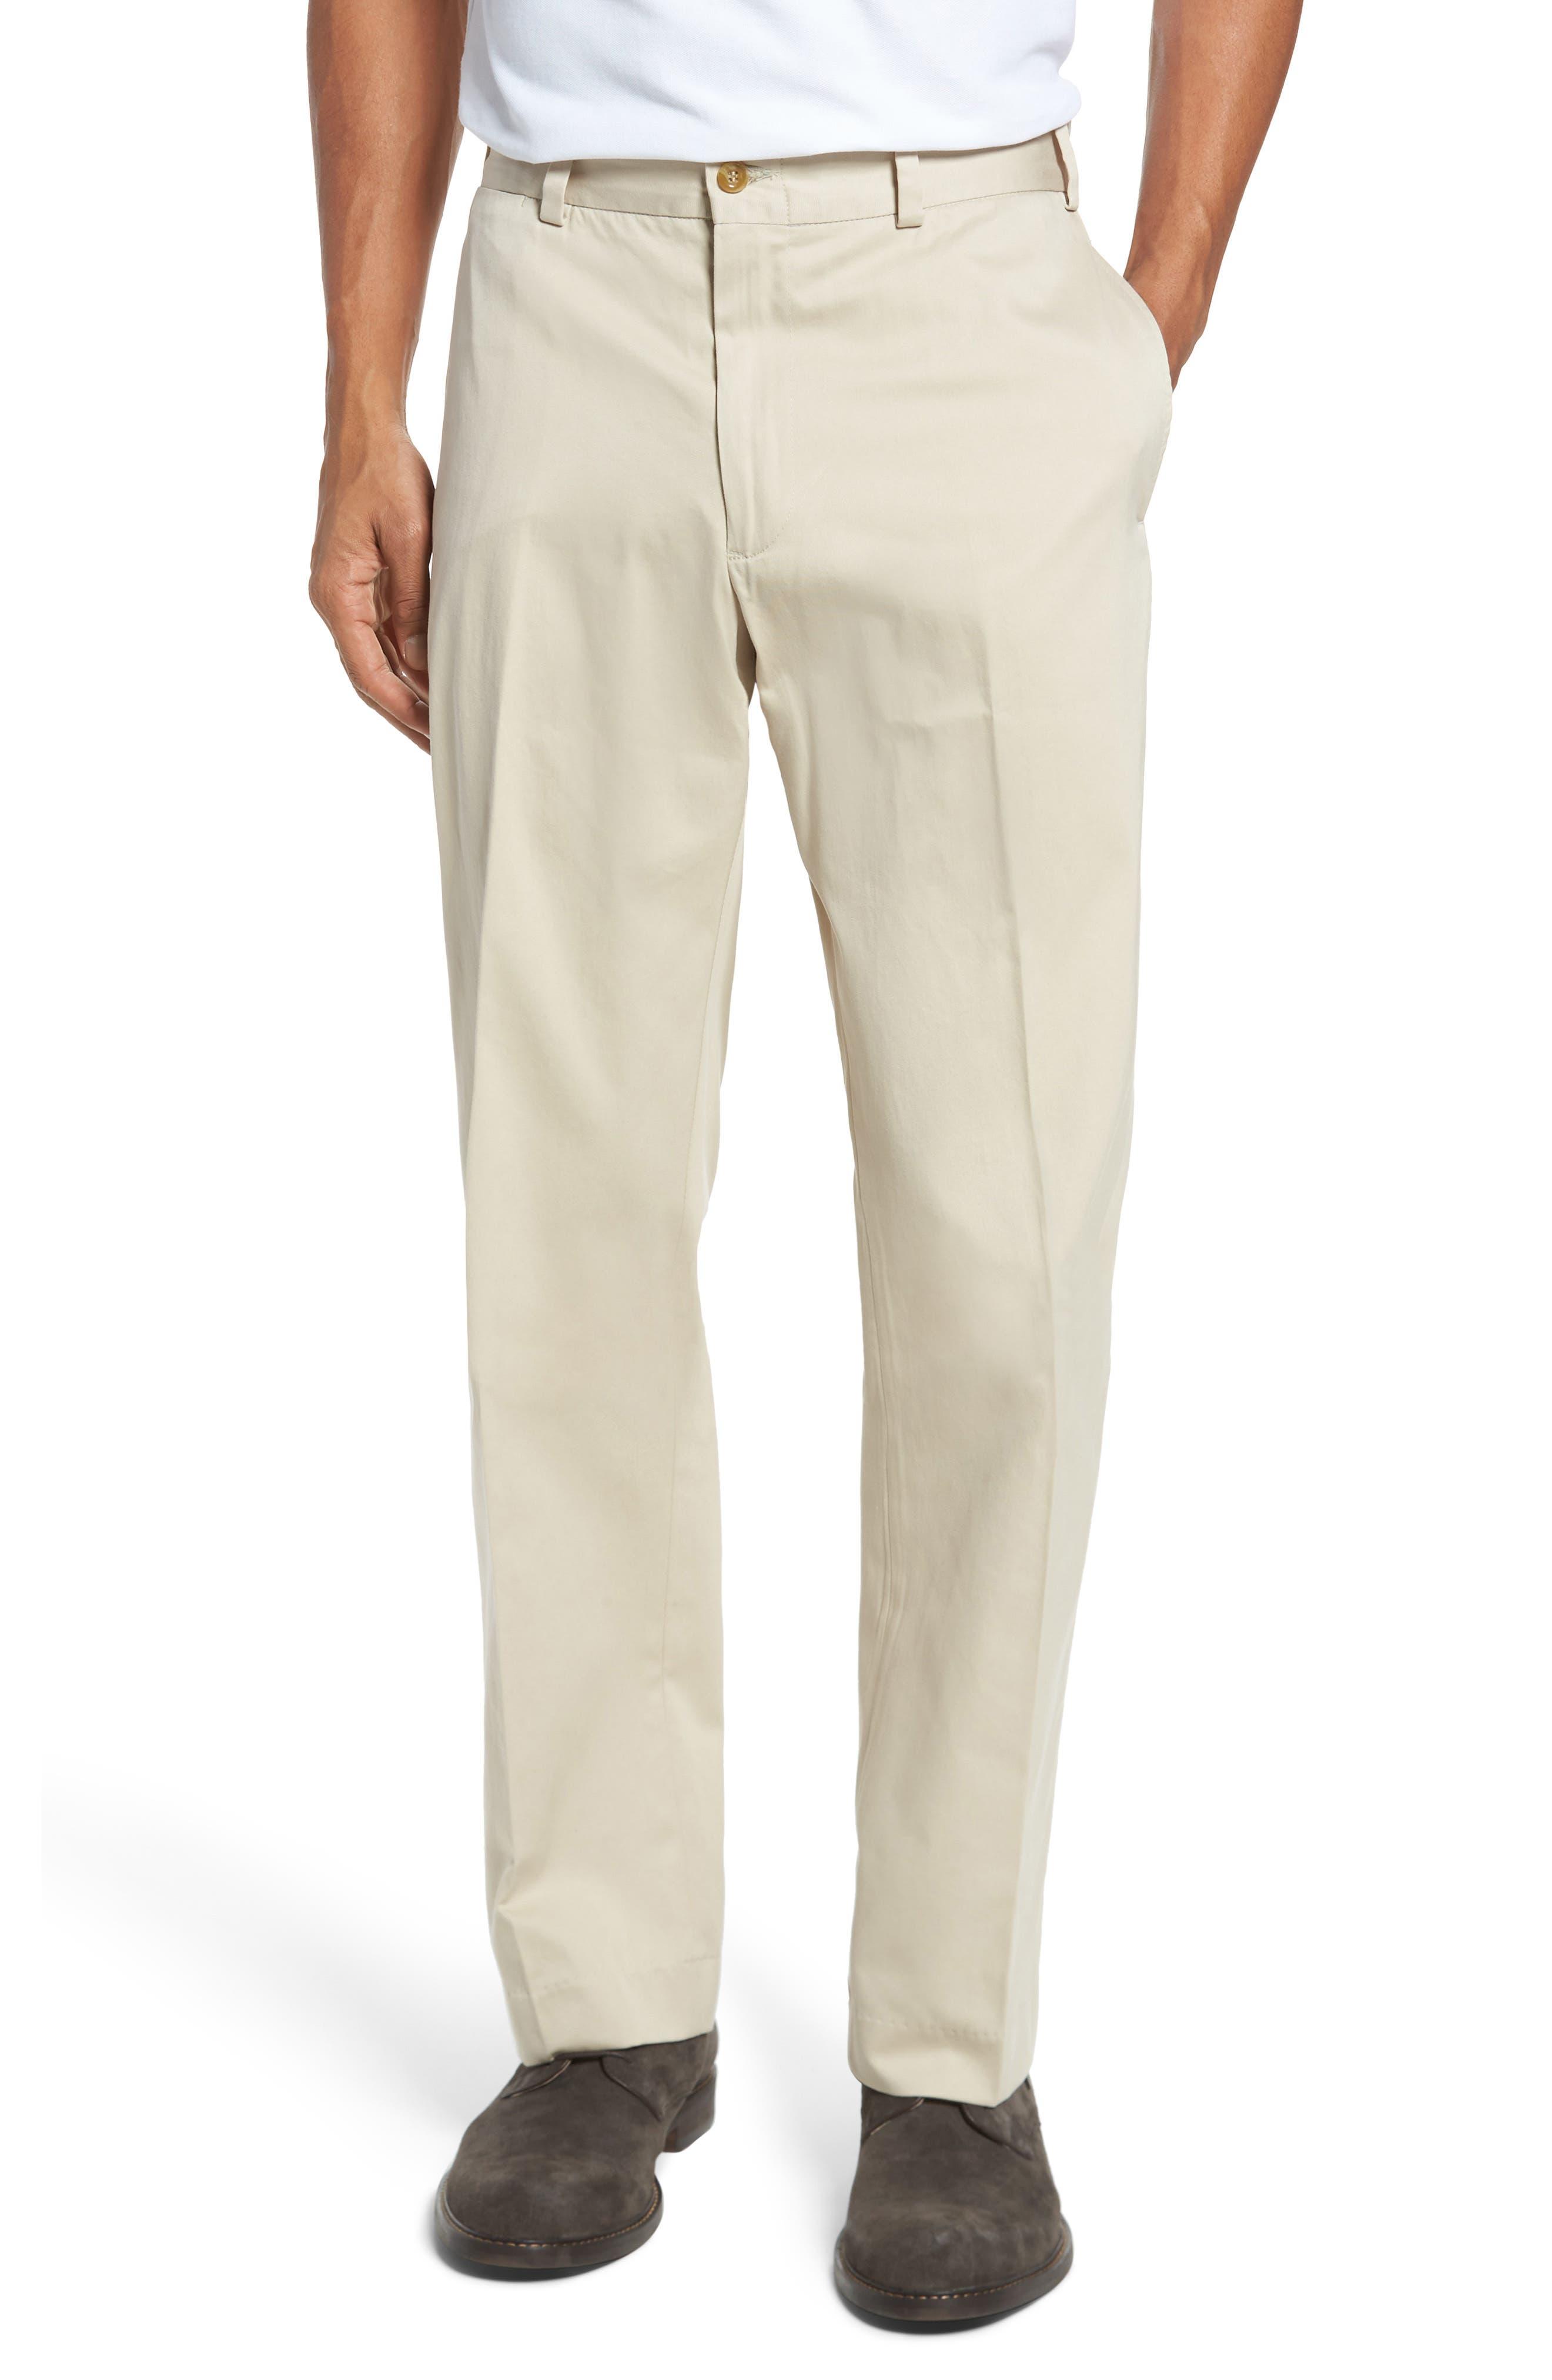 Men's Bills Khakis M2 Classic Fit Chamois Cloth Pants